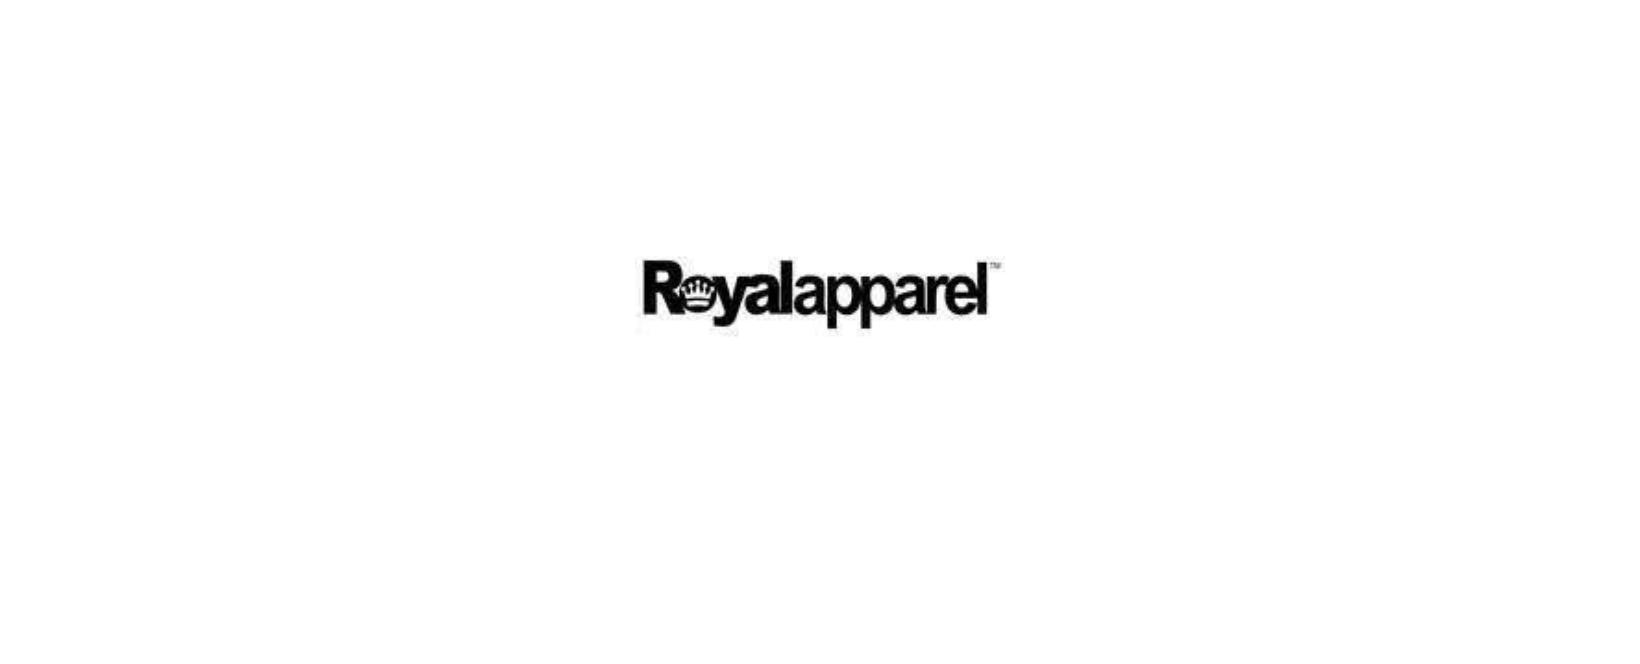 Royal Apparel Discount Code 2021